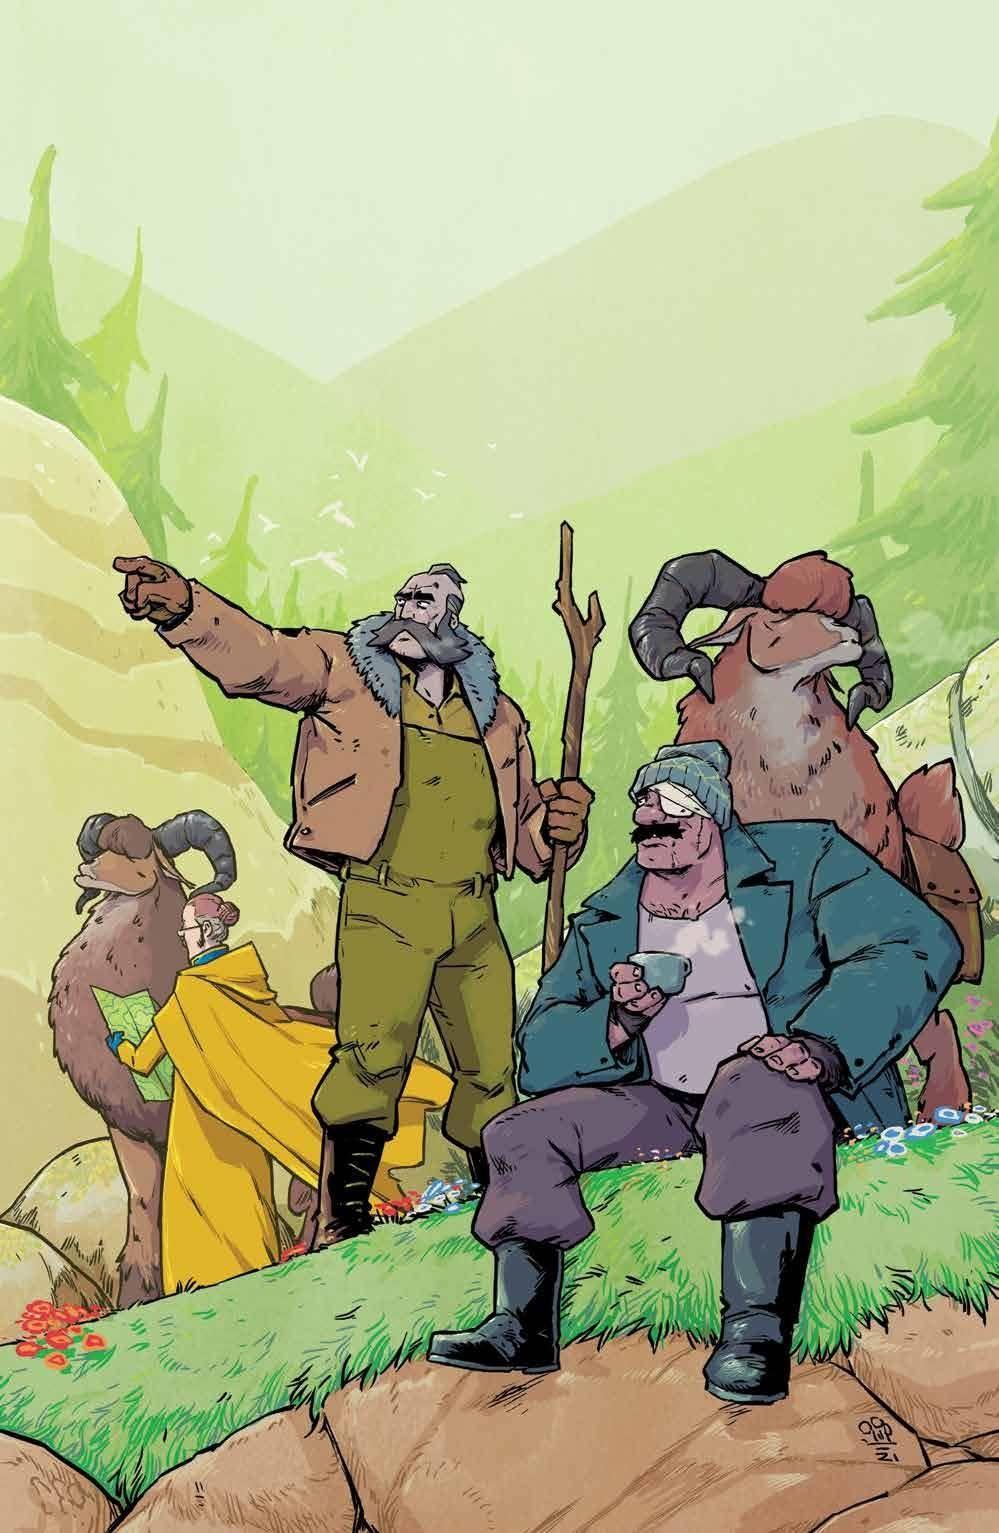 eyJidWNrZXQiOiJnb2NvbGxlY3QuaW1hZ2VzLnB1YiIsImtleSI6Ijk2MGNhNzRiLWMzM2MtNDVhNi05ZjFiLTIyOWZjZjJmYWM1ZC5qcGciLCJlZGl0cyI6W119 ComicList: BOOM! Studios New Releases for 08/04/2021